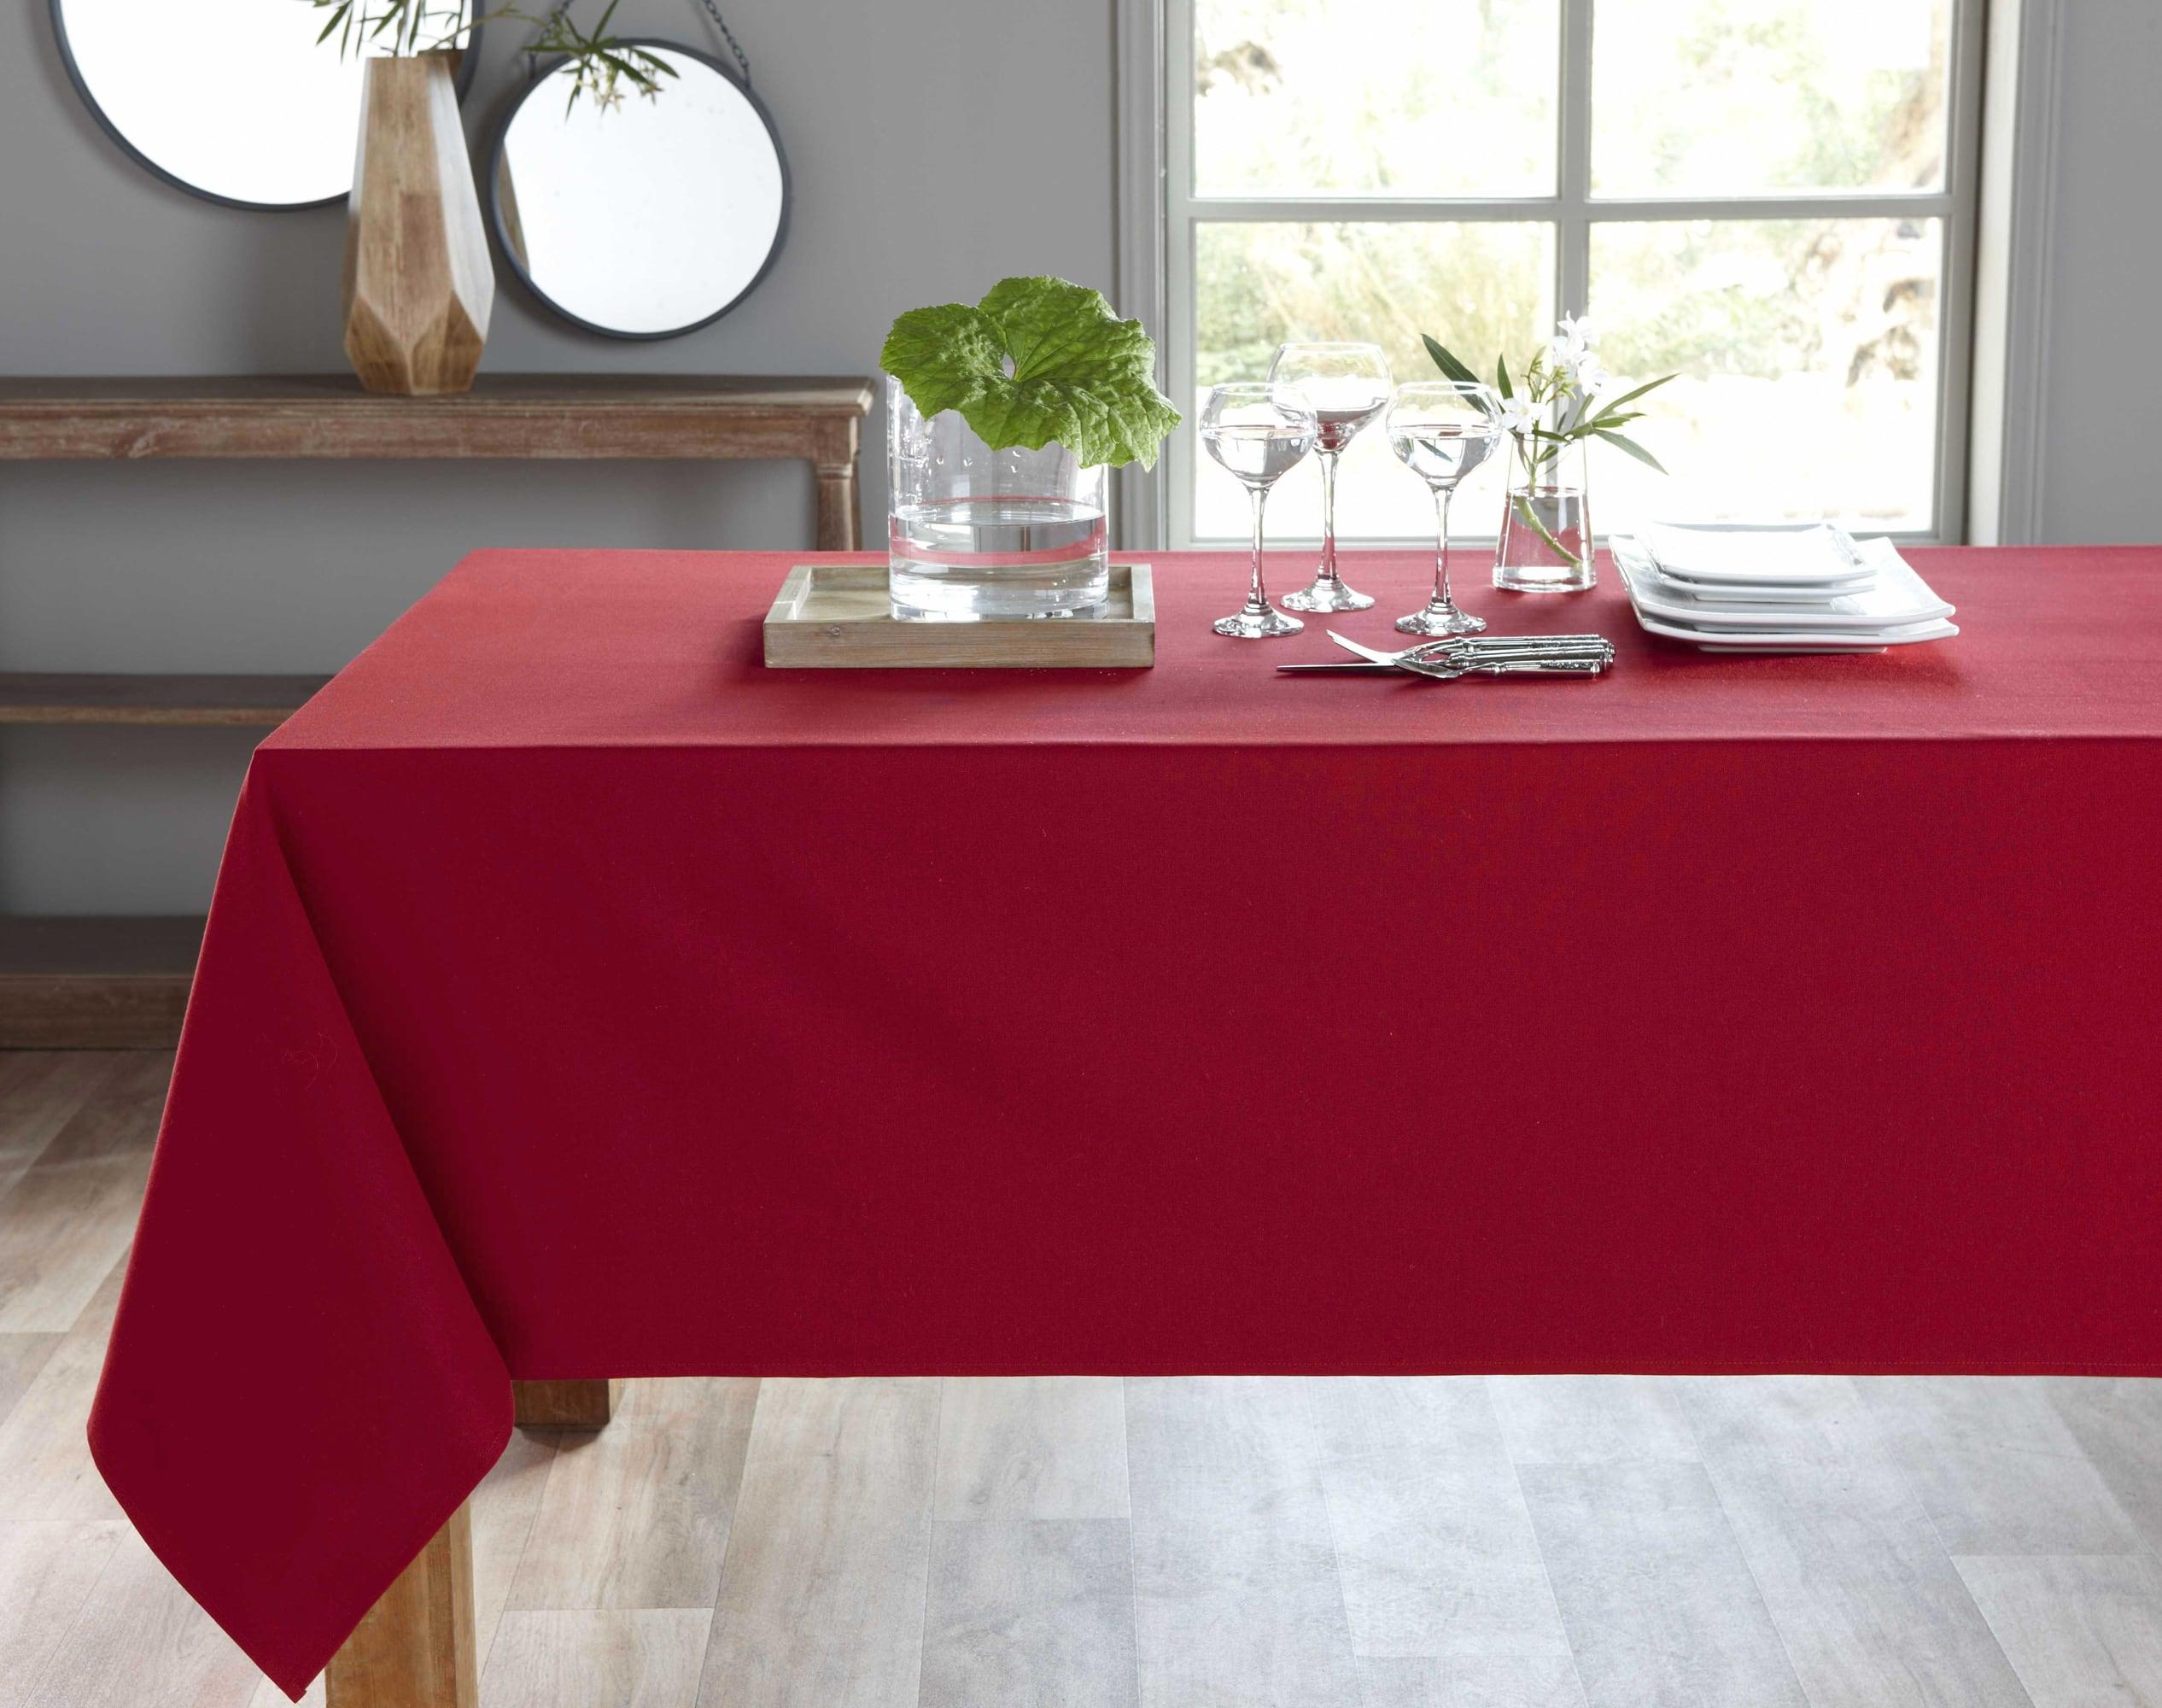 Nappe ronde rose framboise en coton 235x235